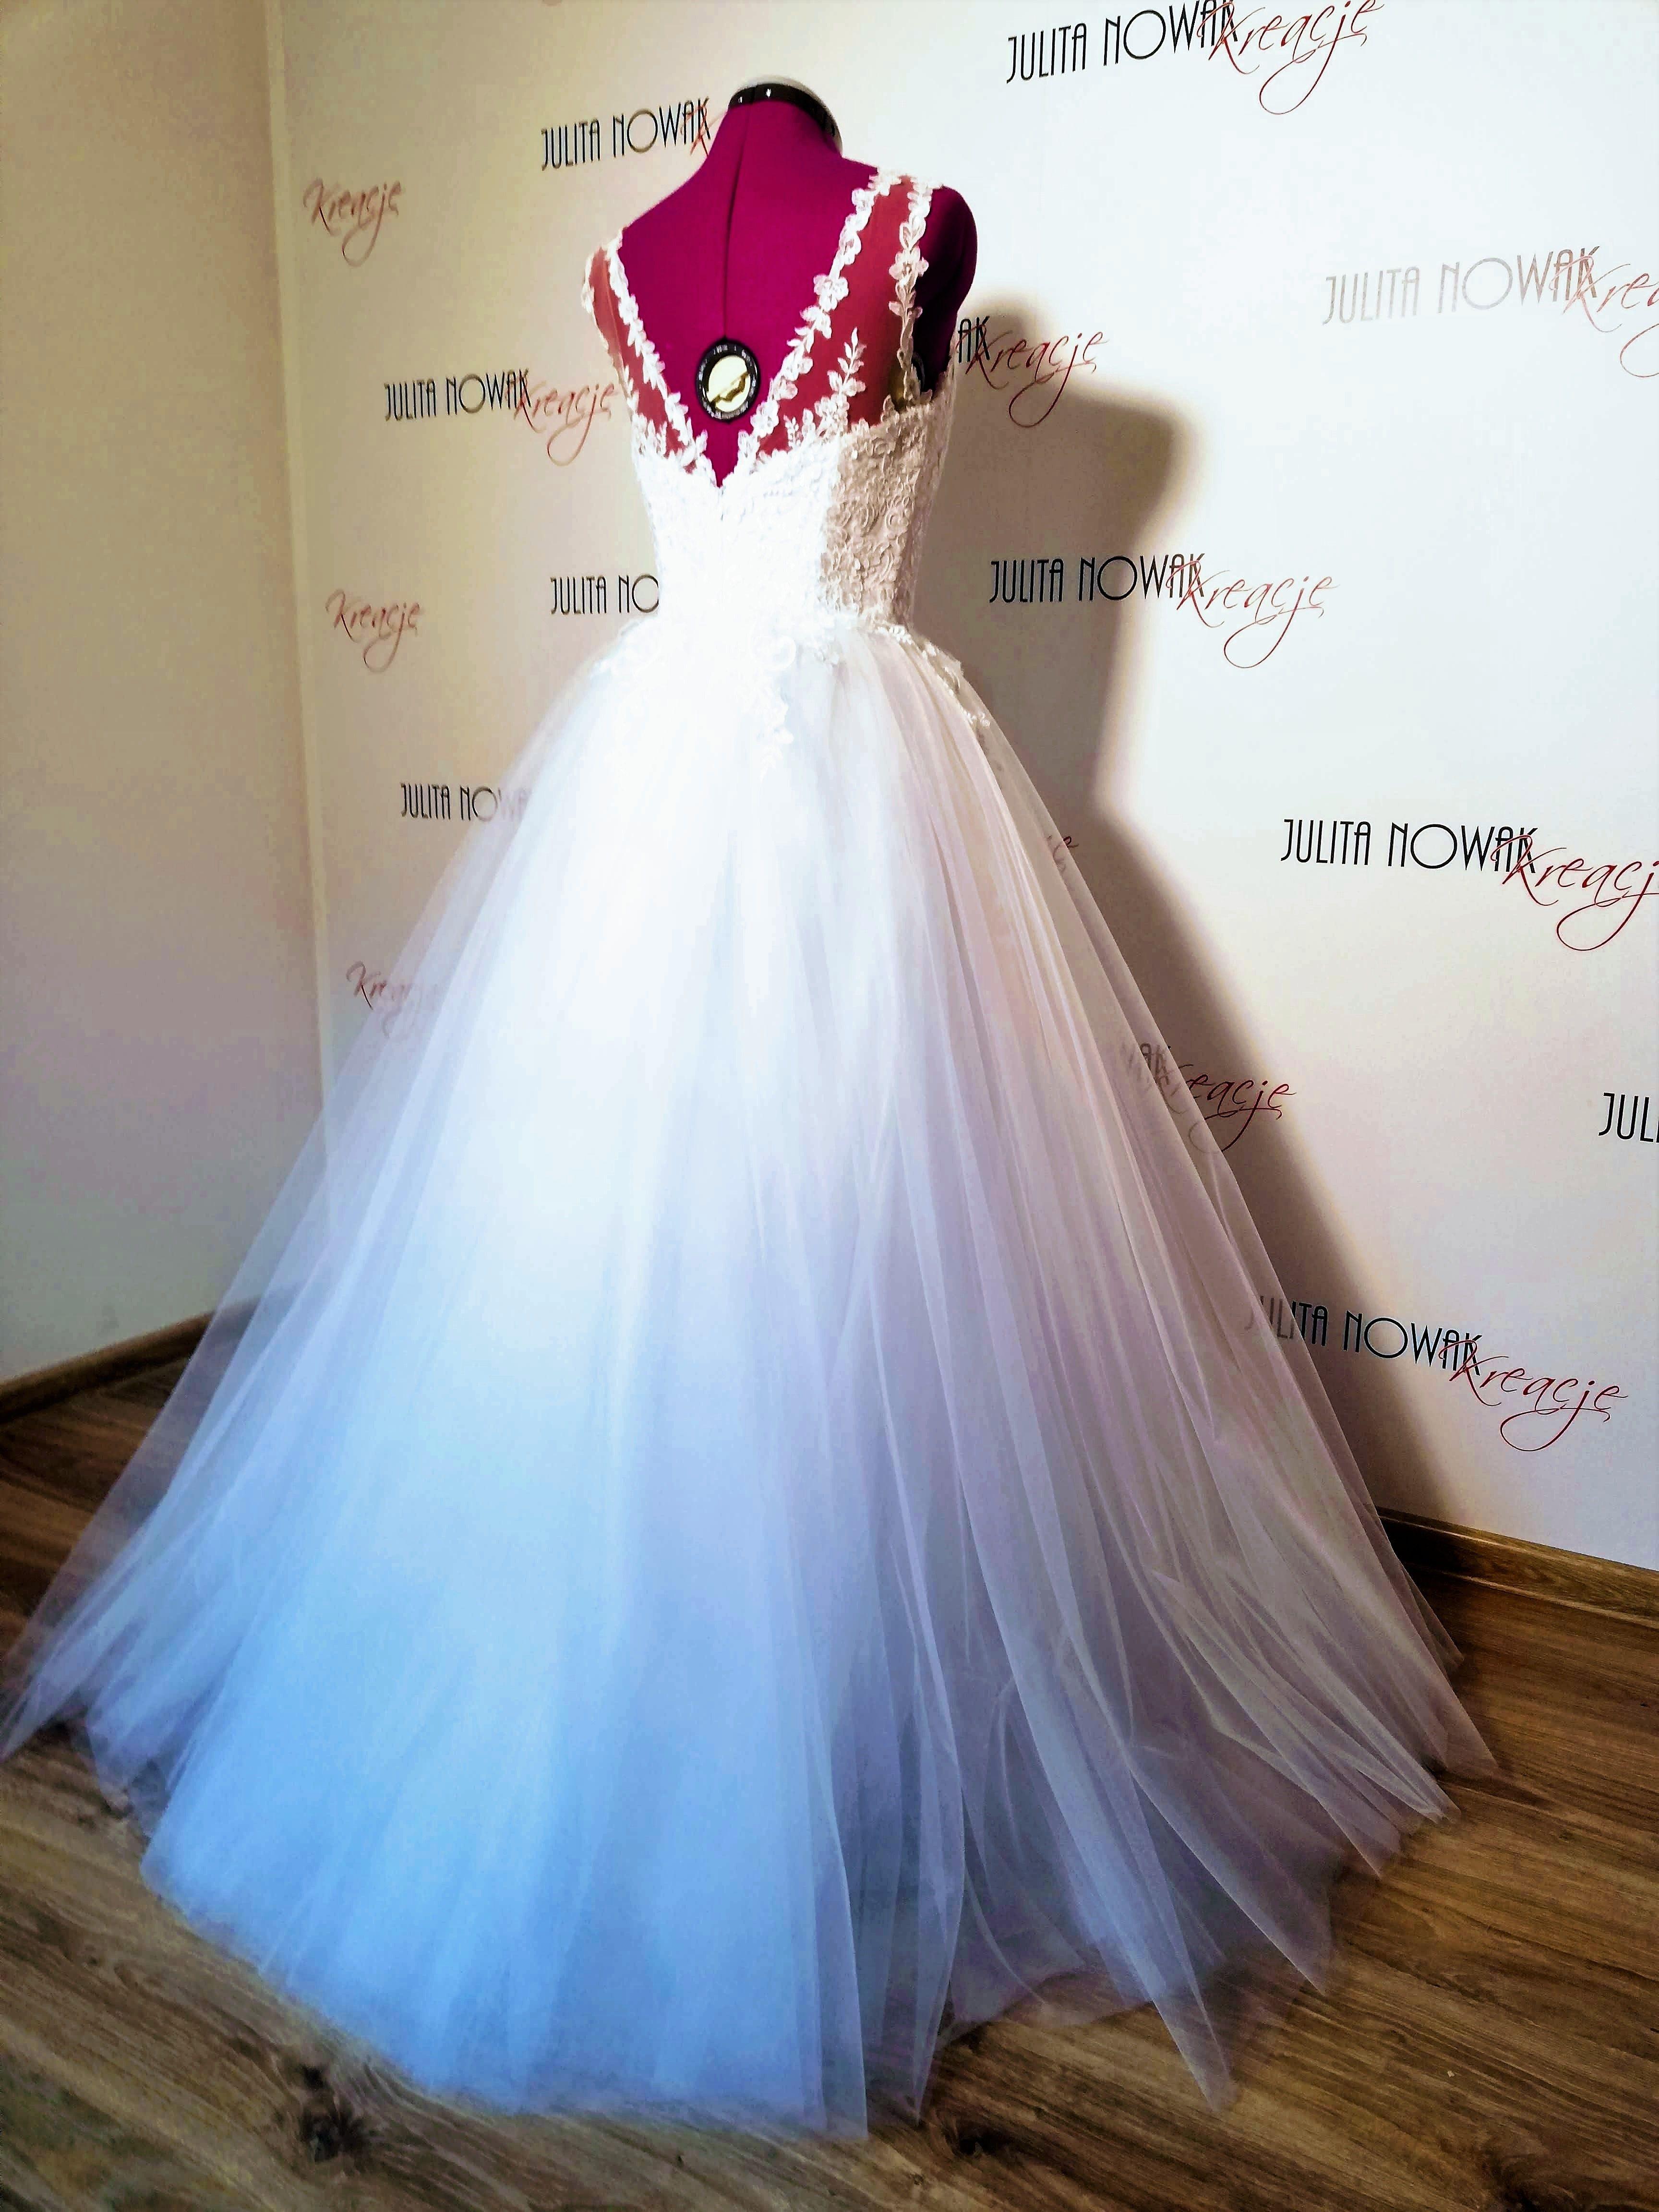 Pin By Julita Nowak On Kreacje Suknie Sukienki Flower Girl Dresses Dresses Girls Dresses